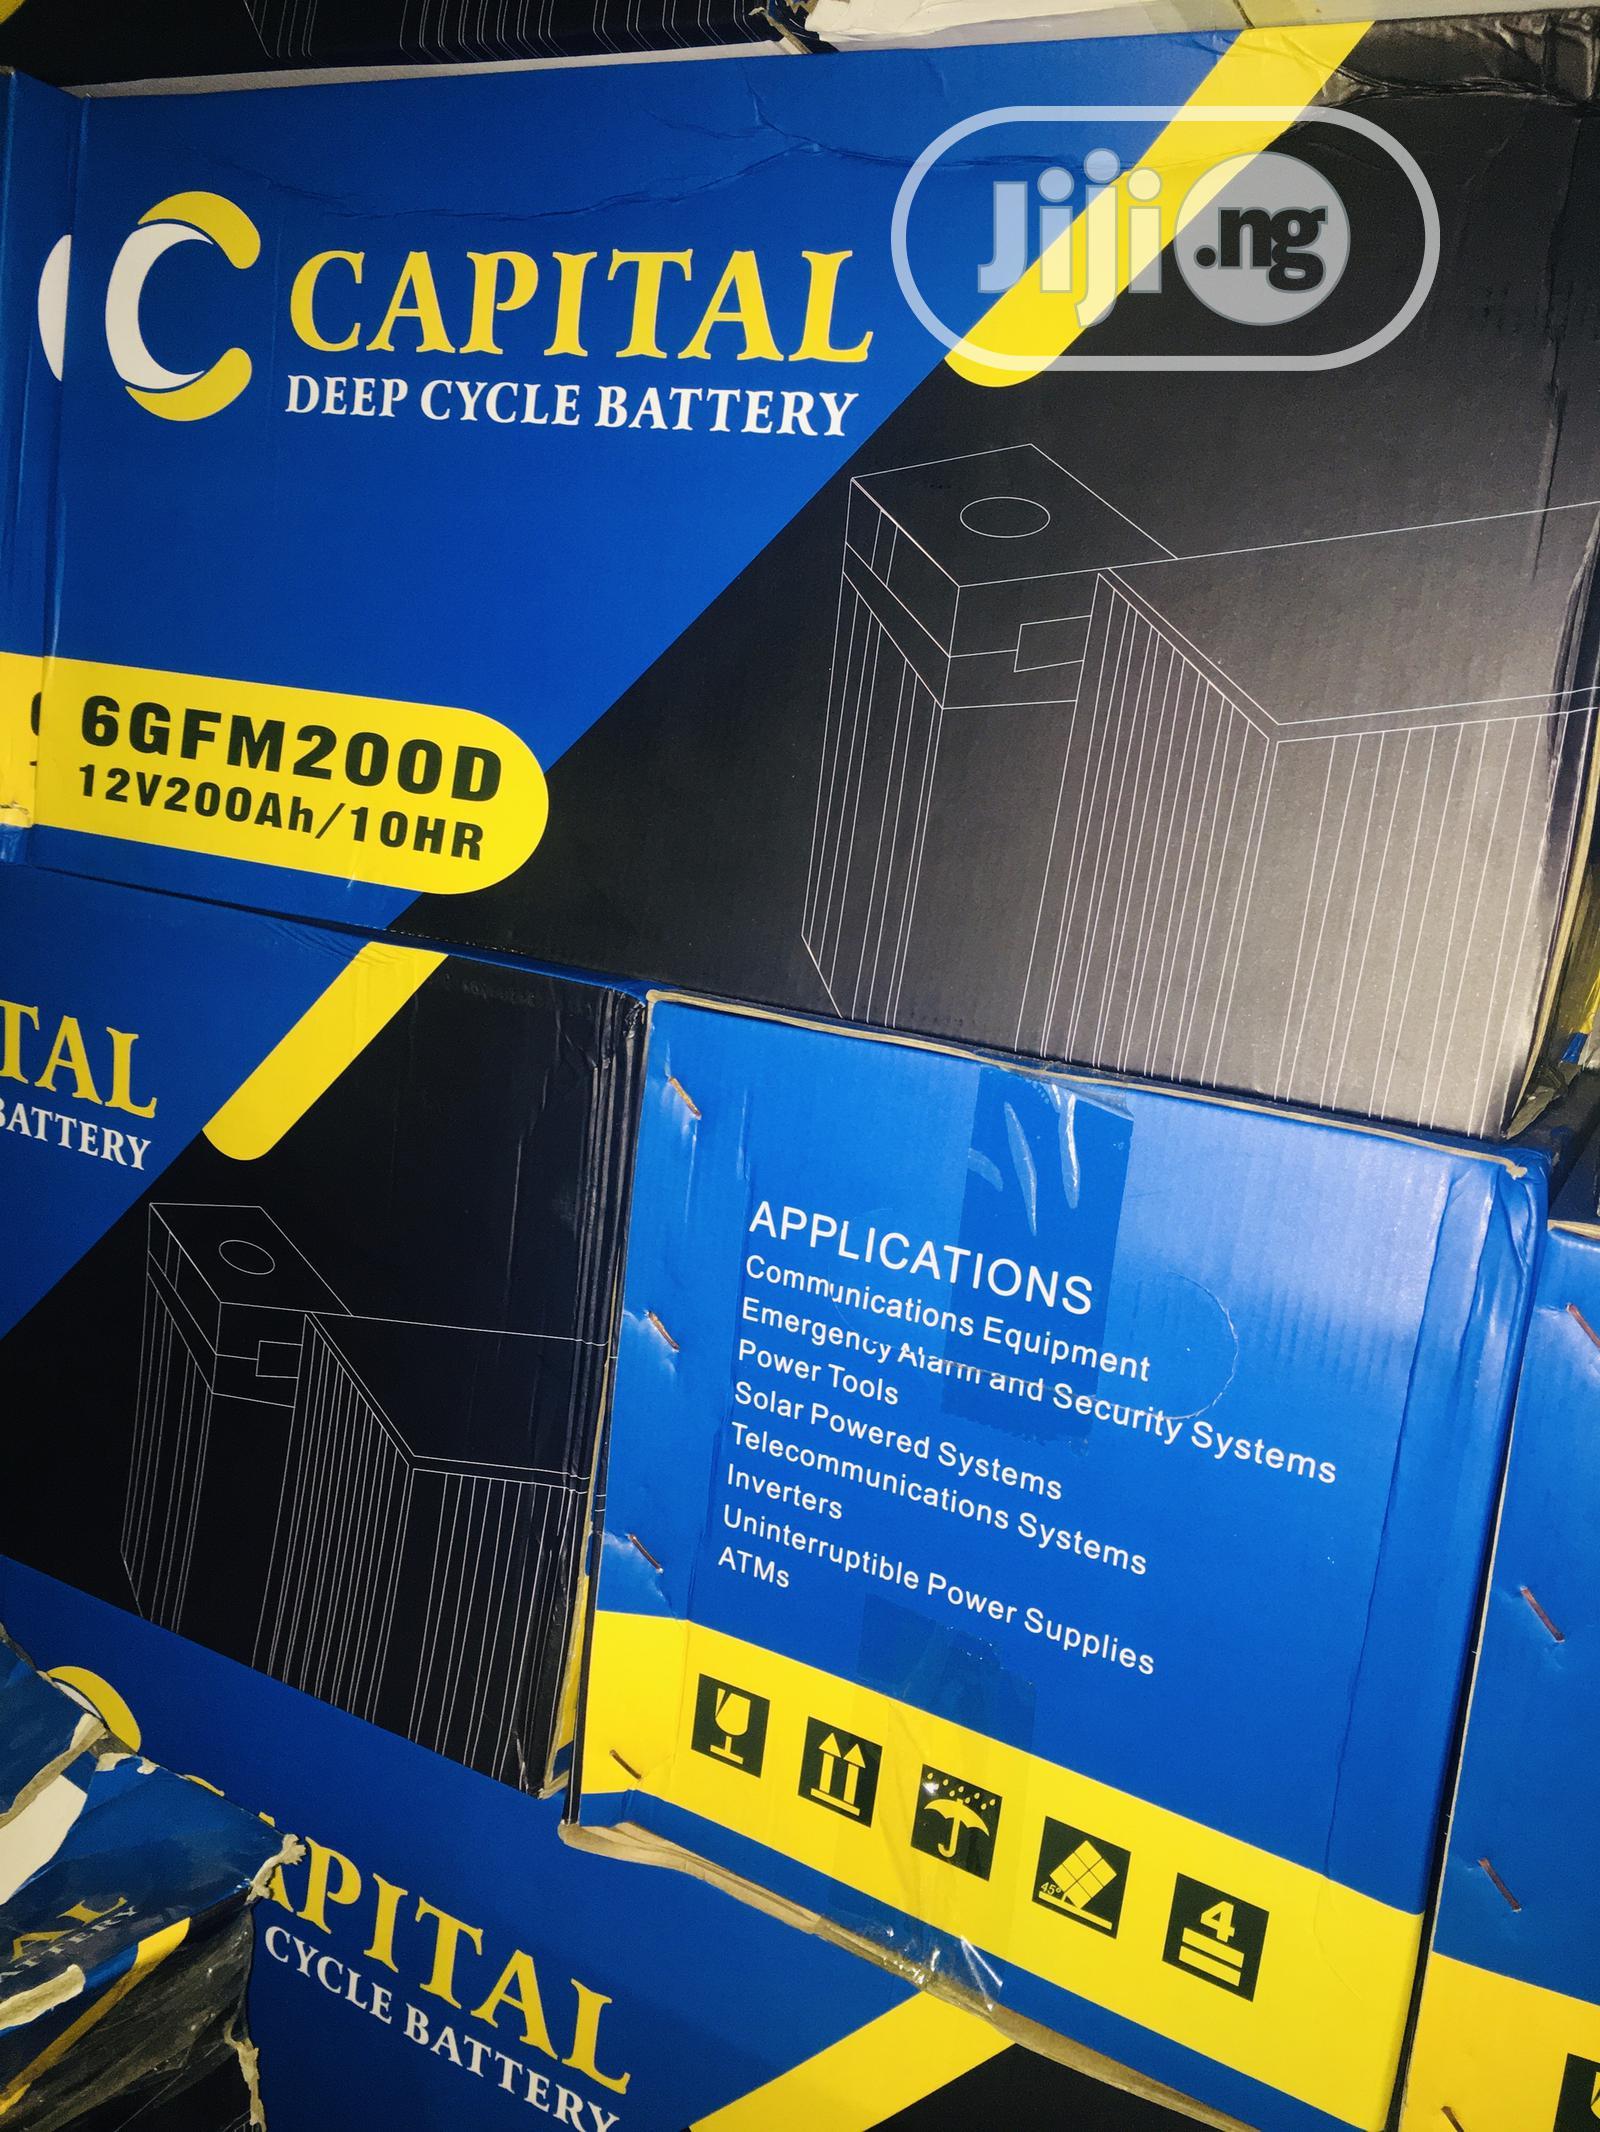 200ah 12v Capital Battery Available With 1yr Warranty